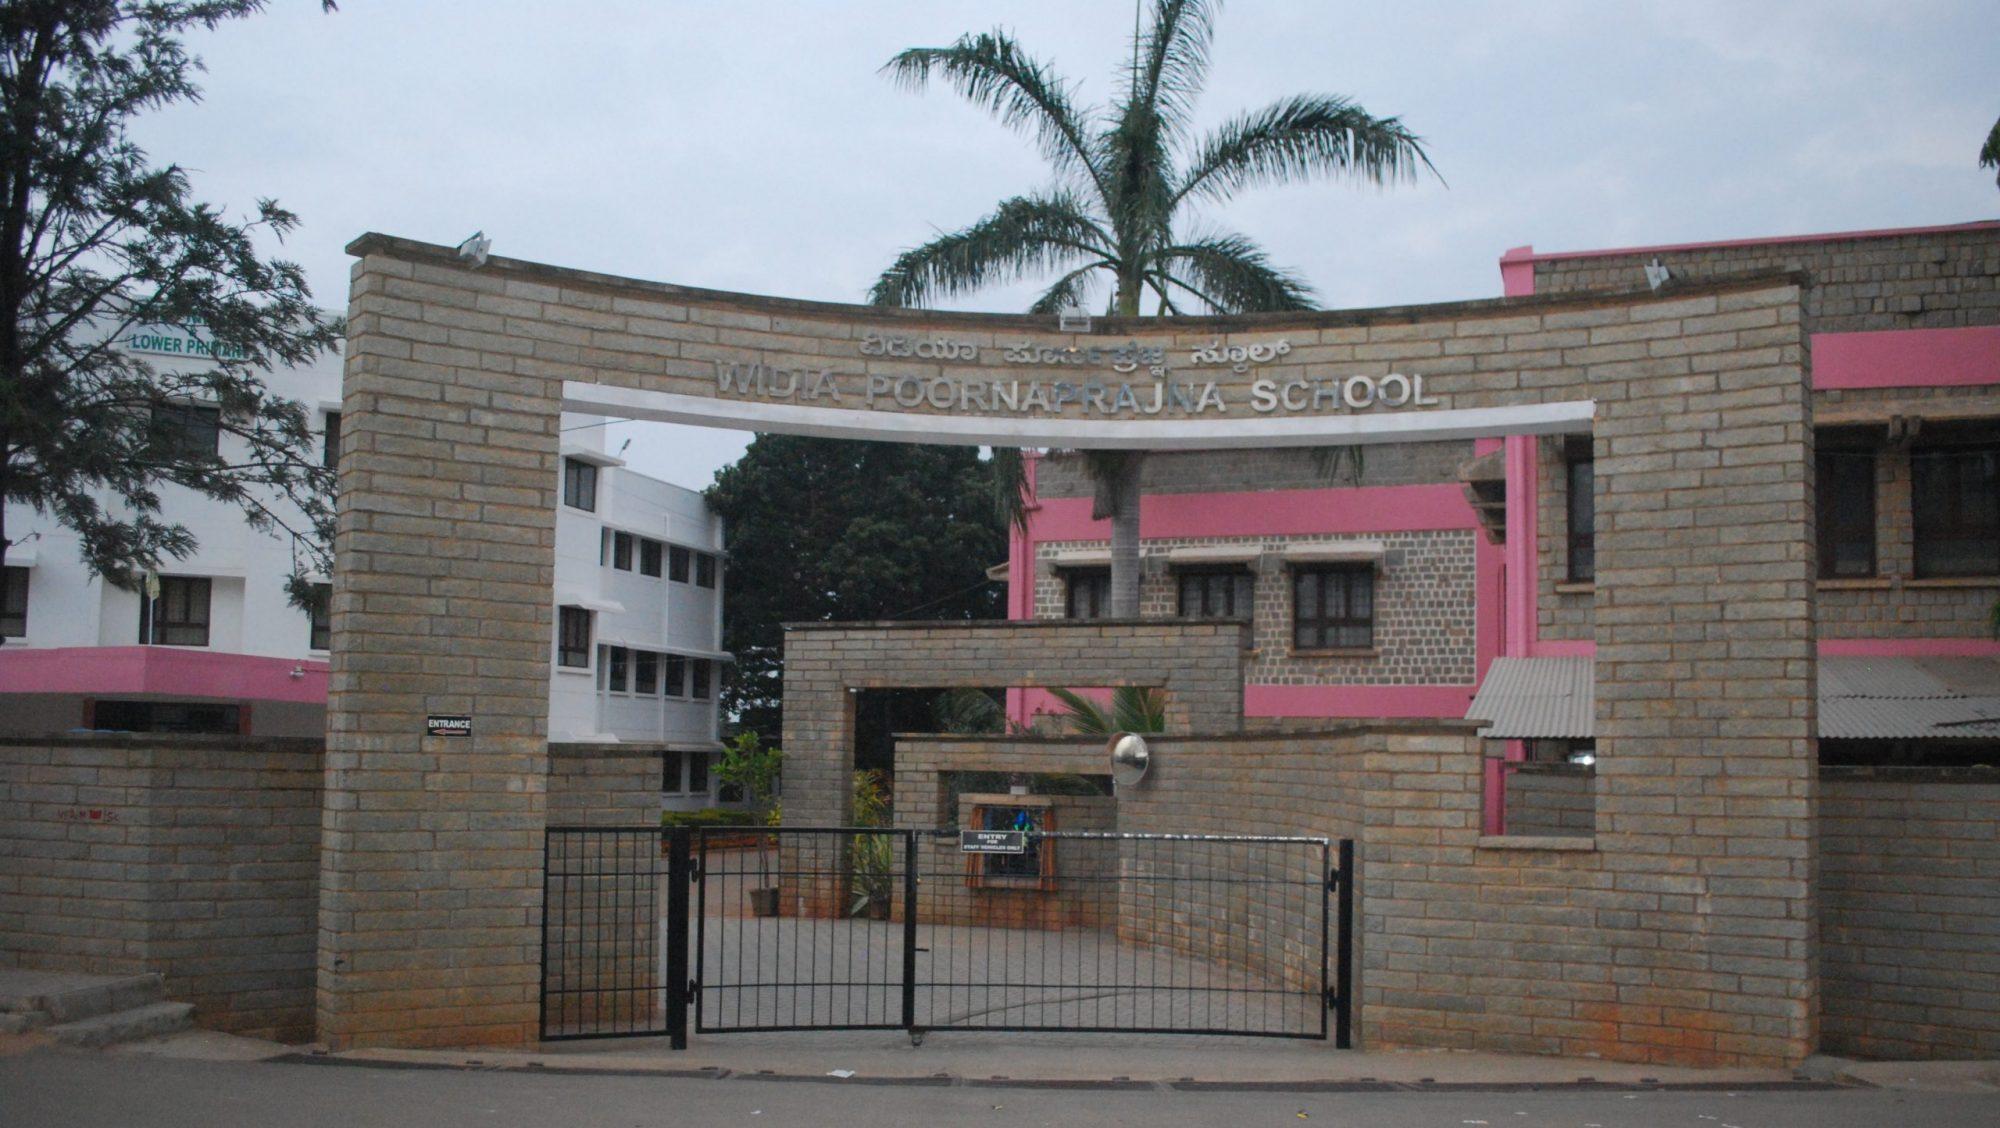 Widia Poorna Prajna School